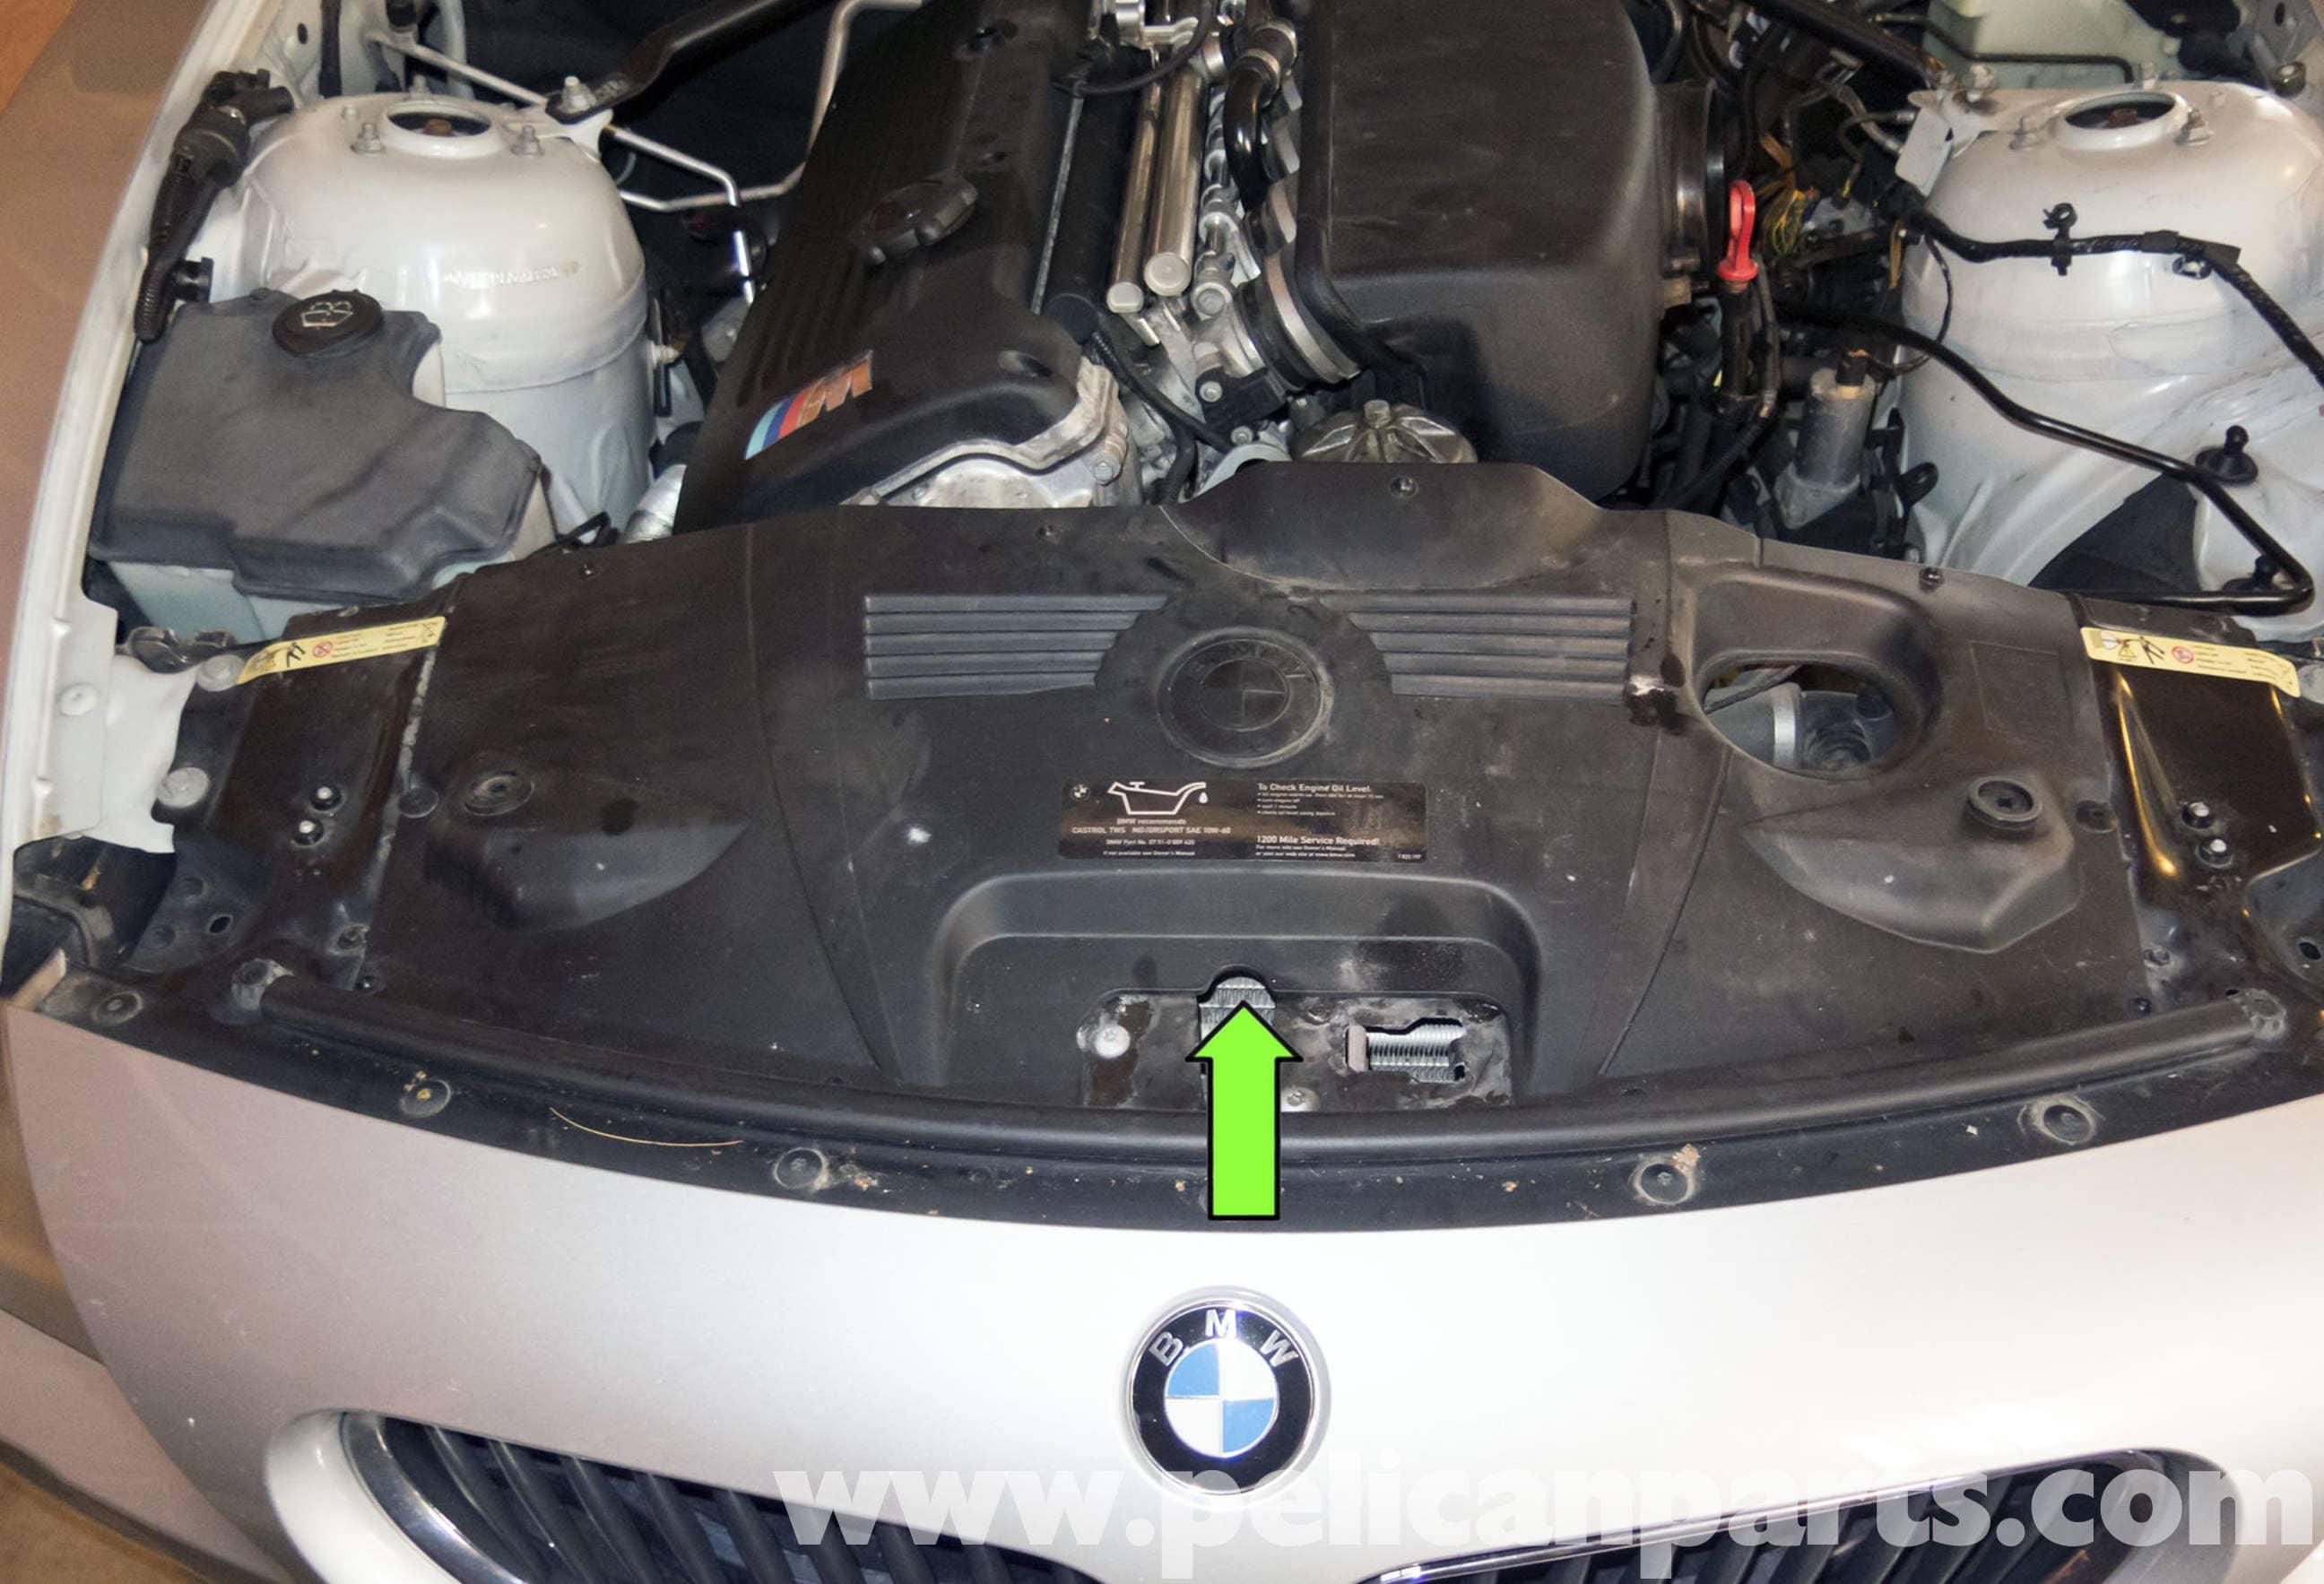 Bmw Z4 M Radiator Replacement 2003 2006 Pelican Parts Diy Maintenance Article